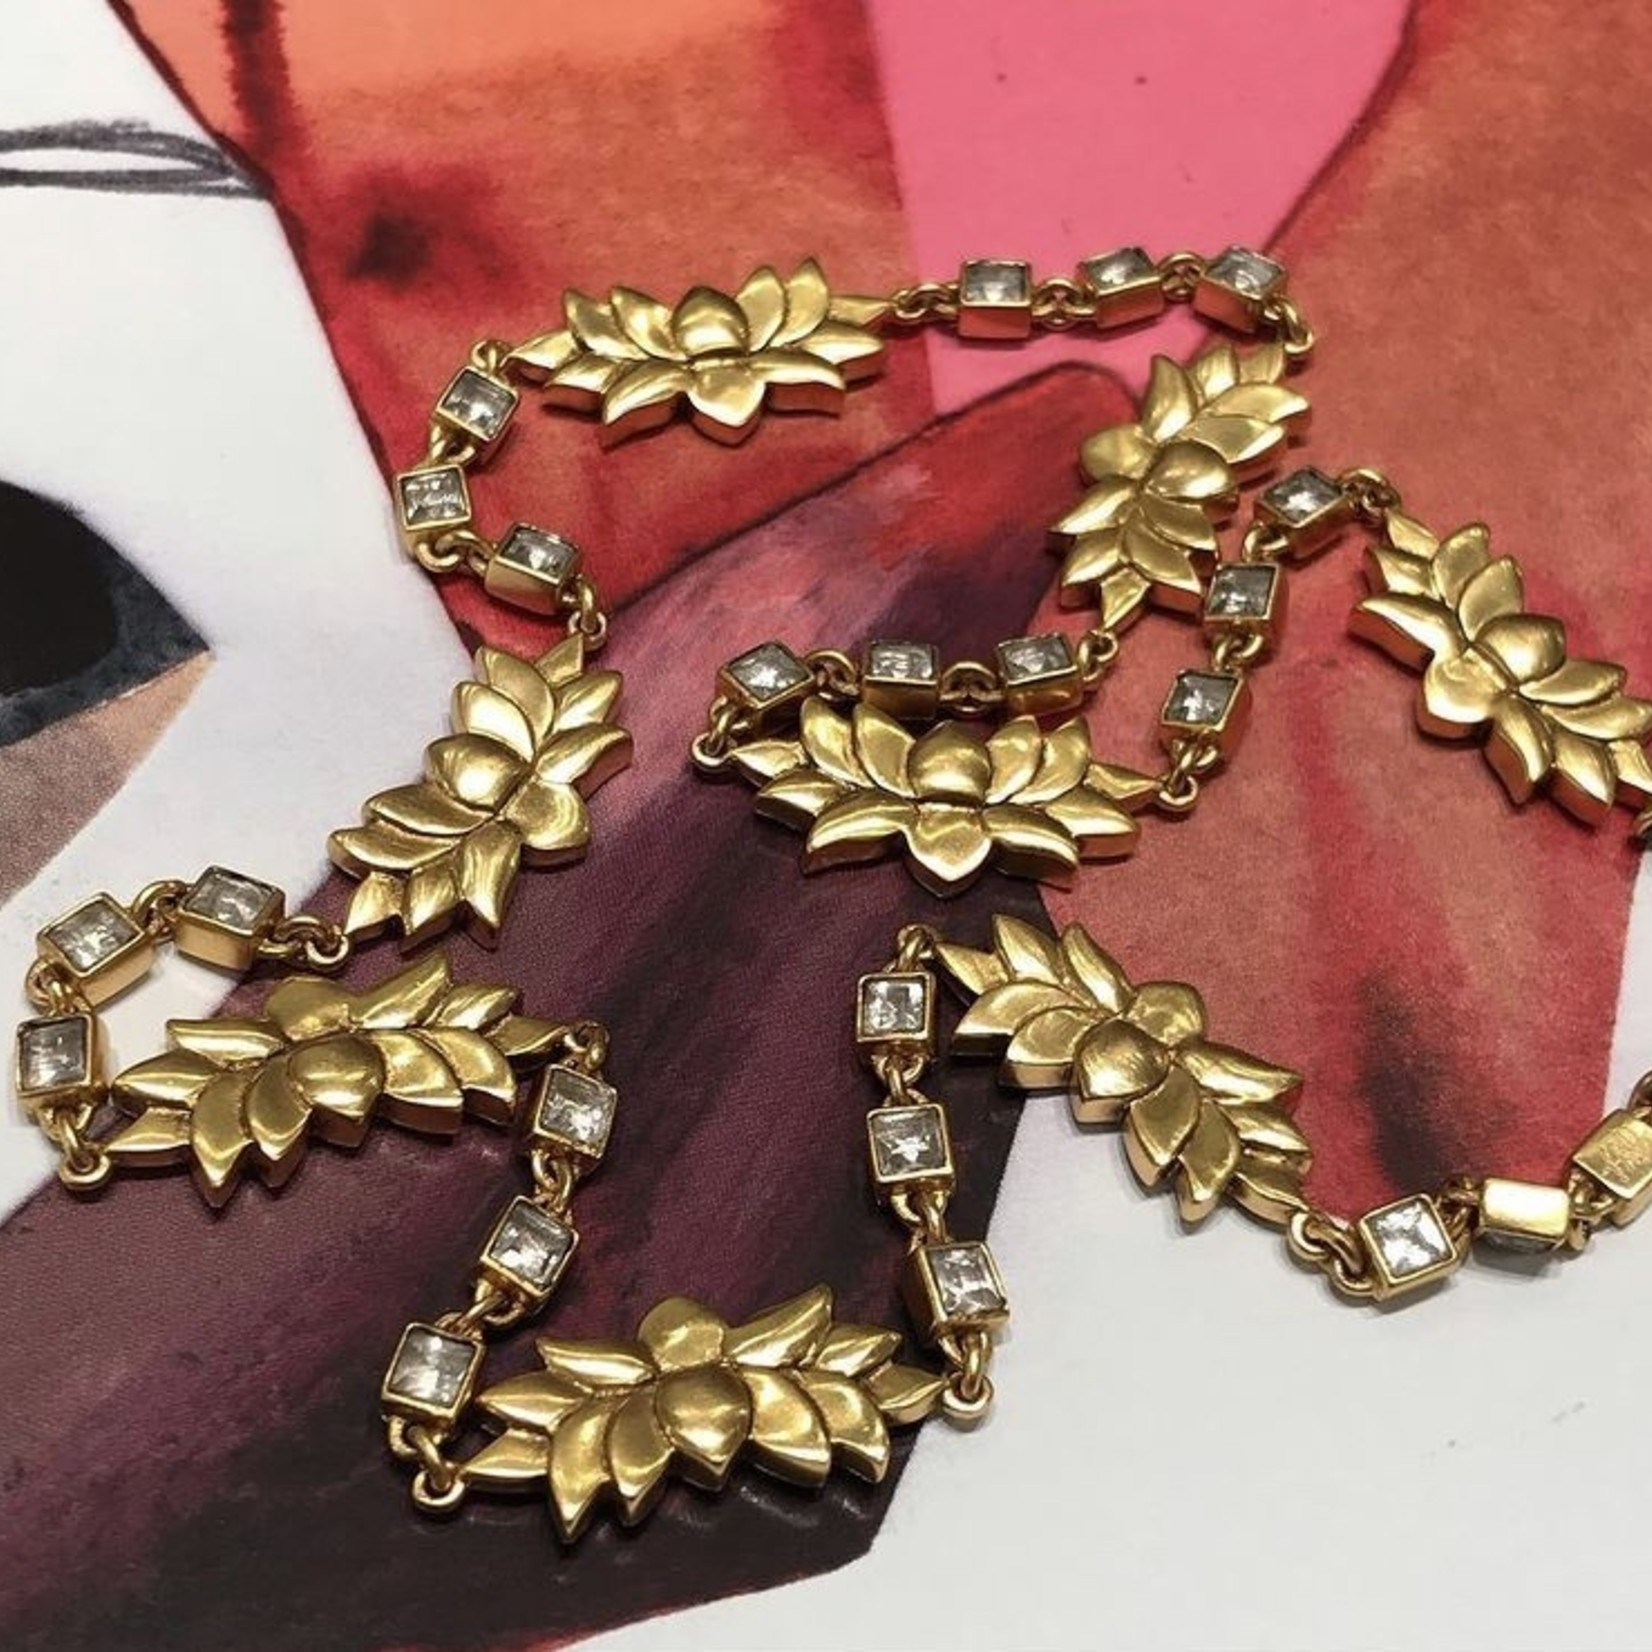 Himatsingka Jewelry Lotuspad Gold Plated Crystal Necklace